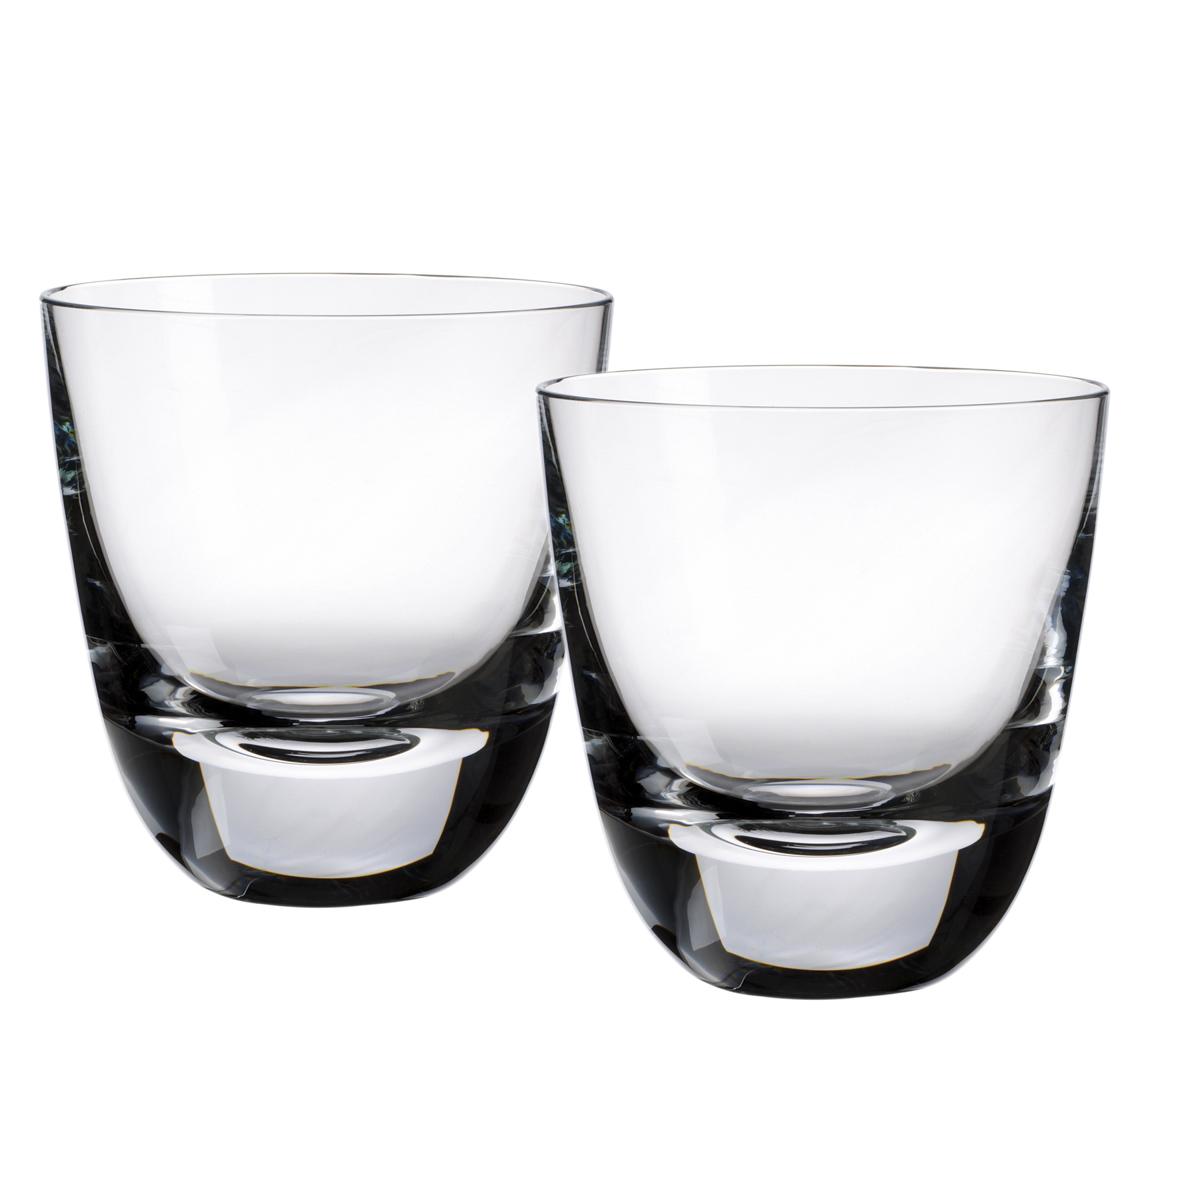 Set/2 Single Old Fashioned Glasses